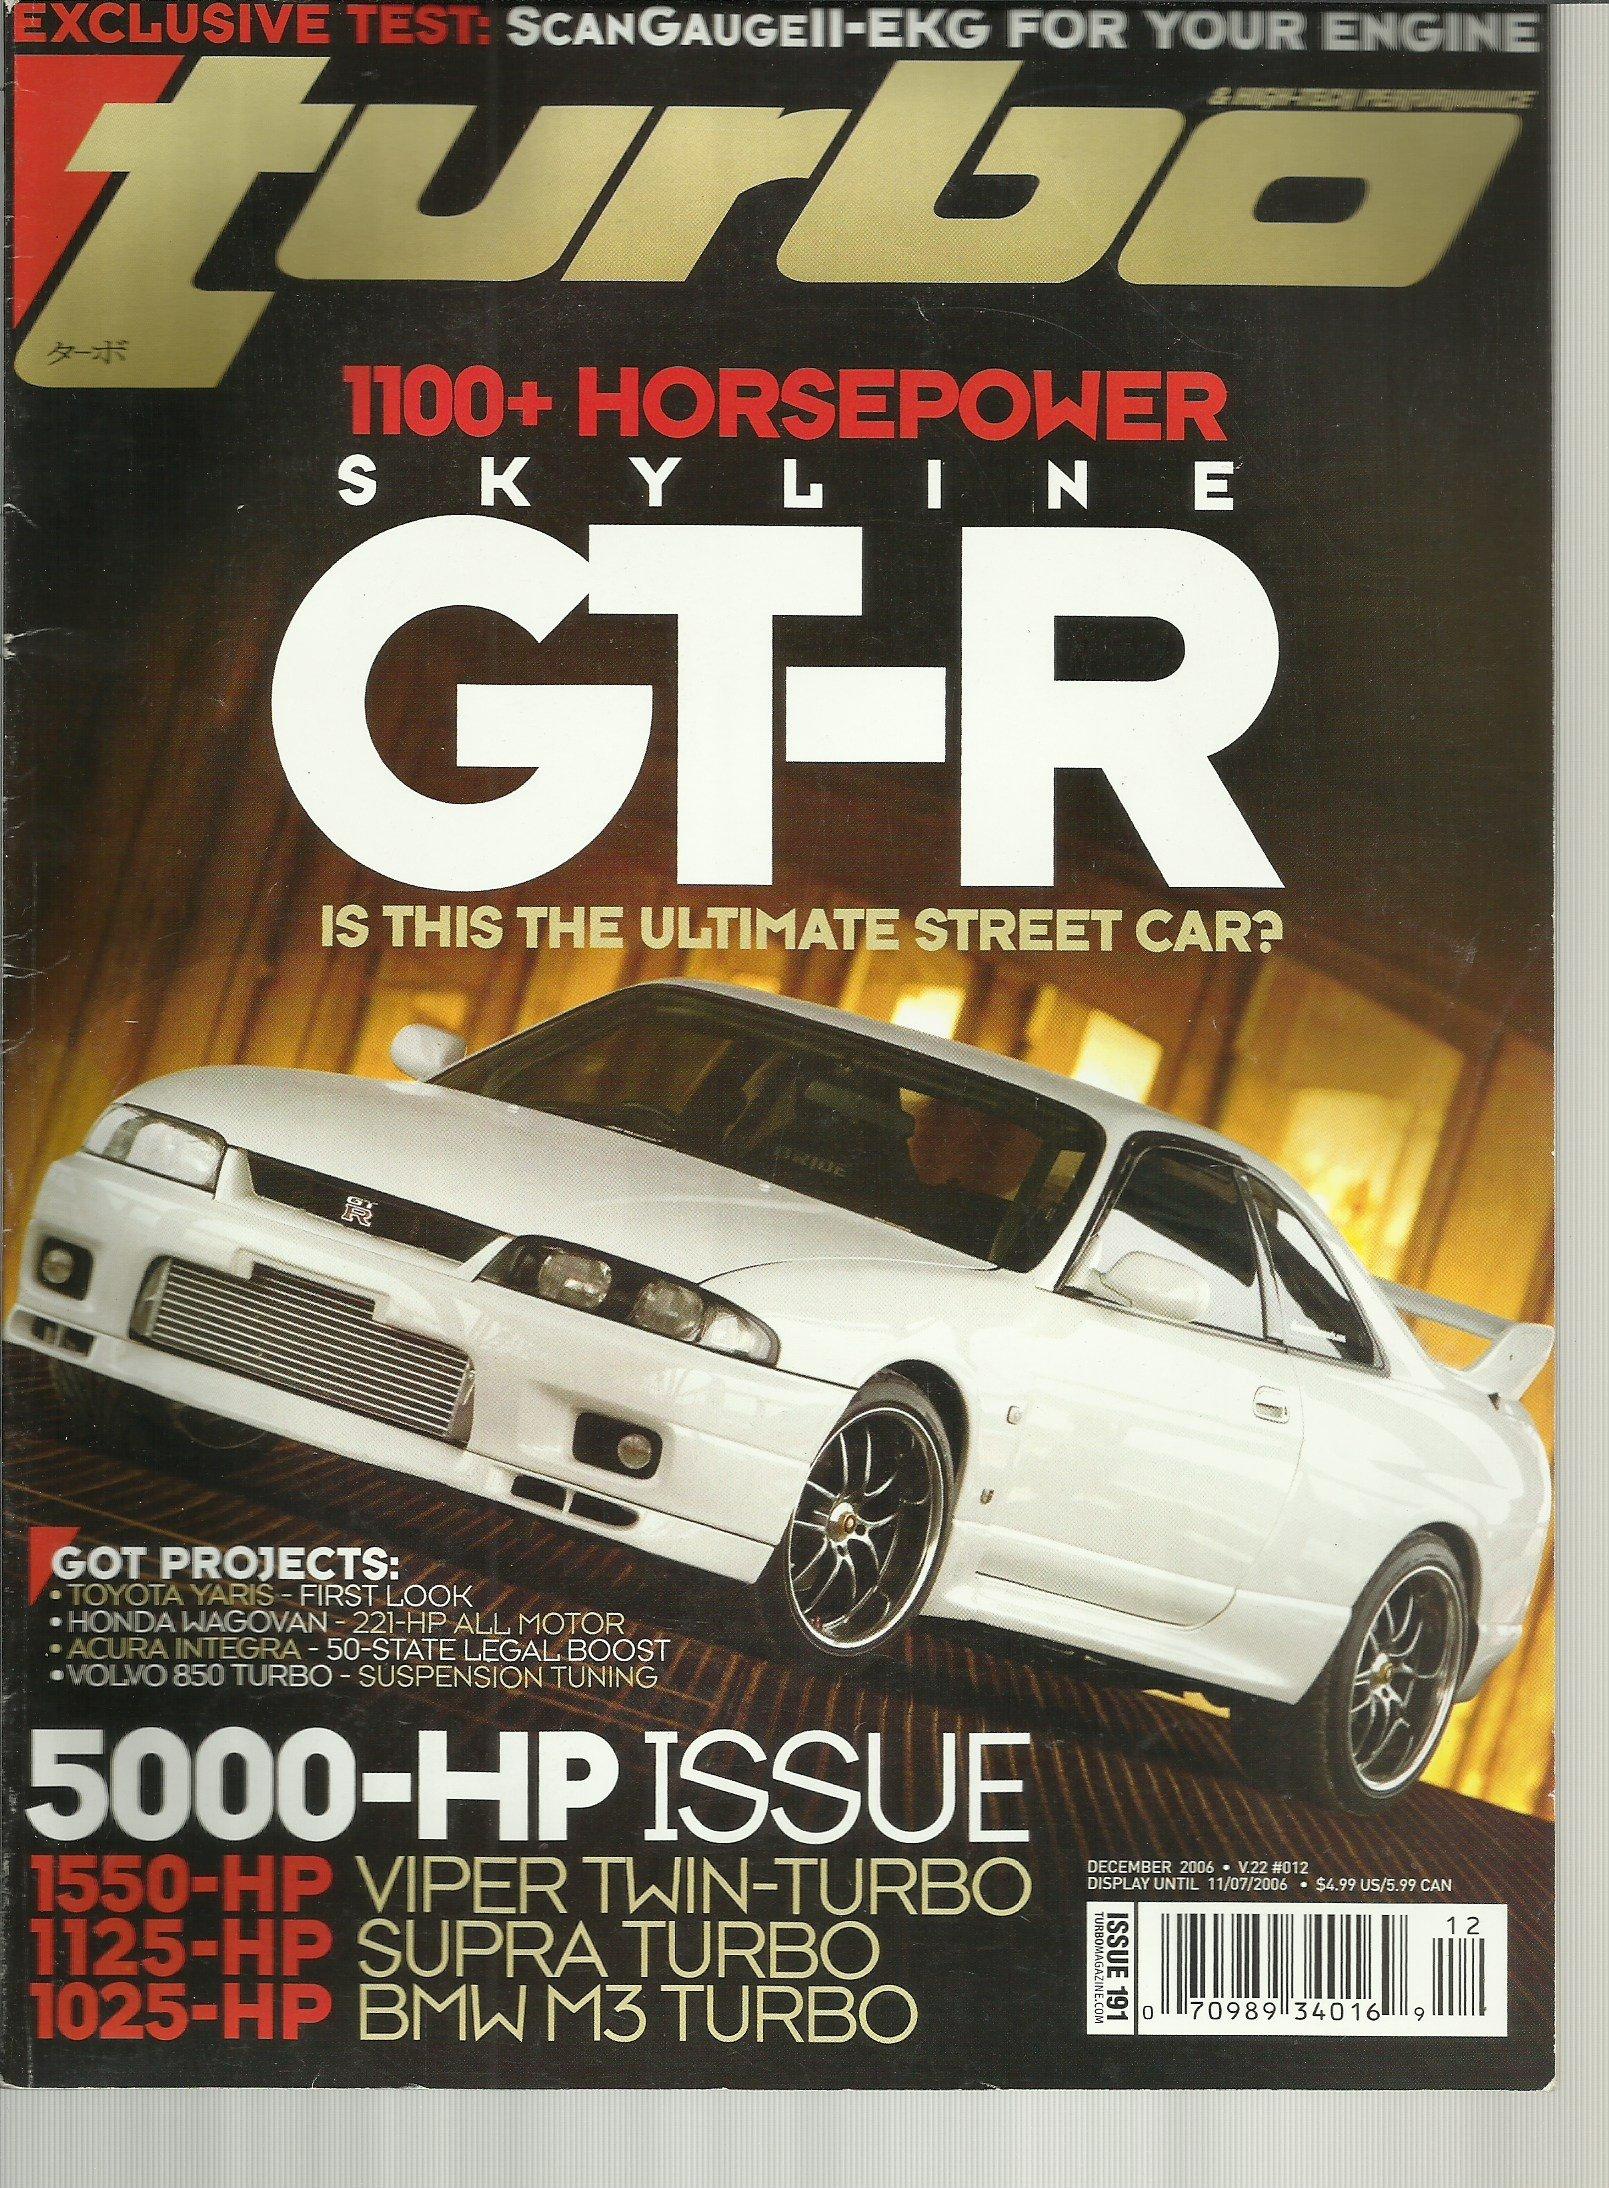 Turbo & High-Tech Performance Magazine December 2006 Skyline GTR 1100+ Horsepower, 5000 Hp Issue, EKG For Your Engine and More Single Issue Magazine – 2006